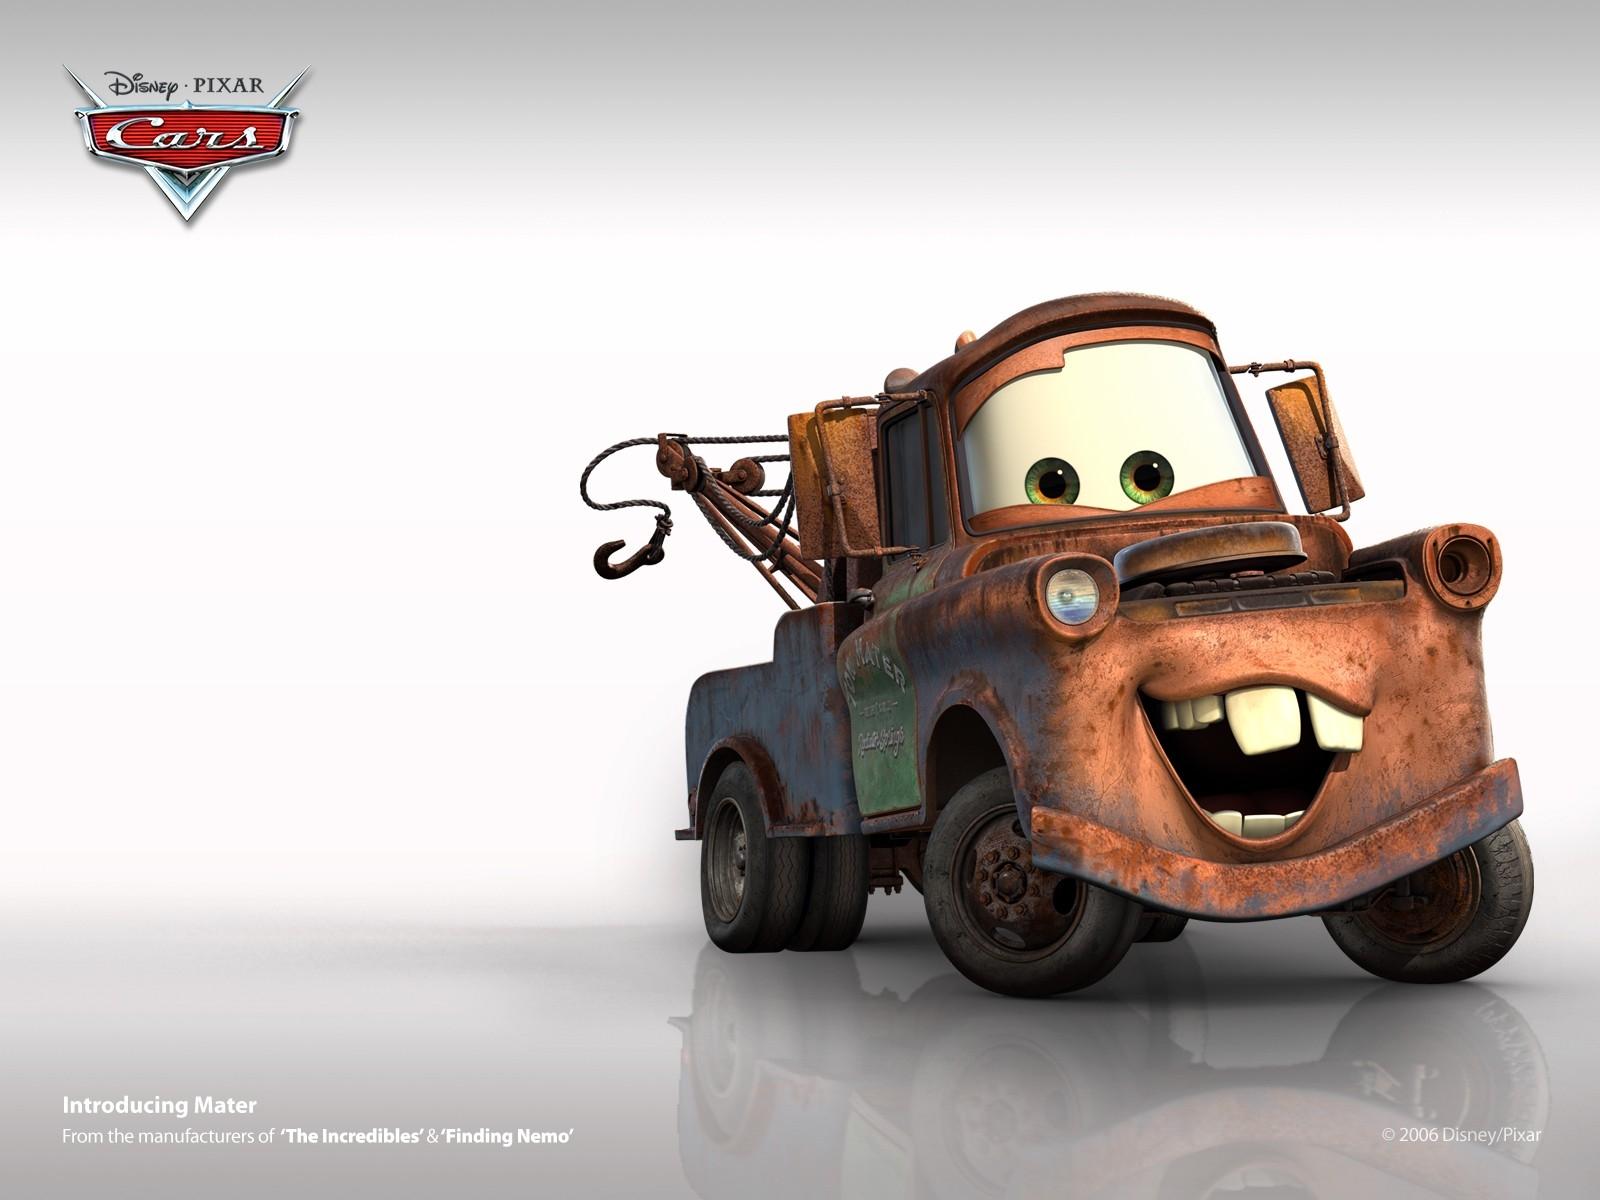 Un wallpaper di Mater del film Cars - motori ruggenti